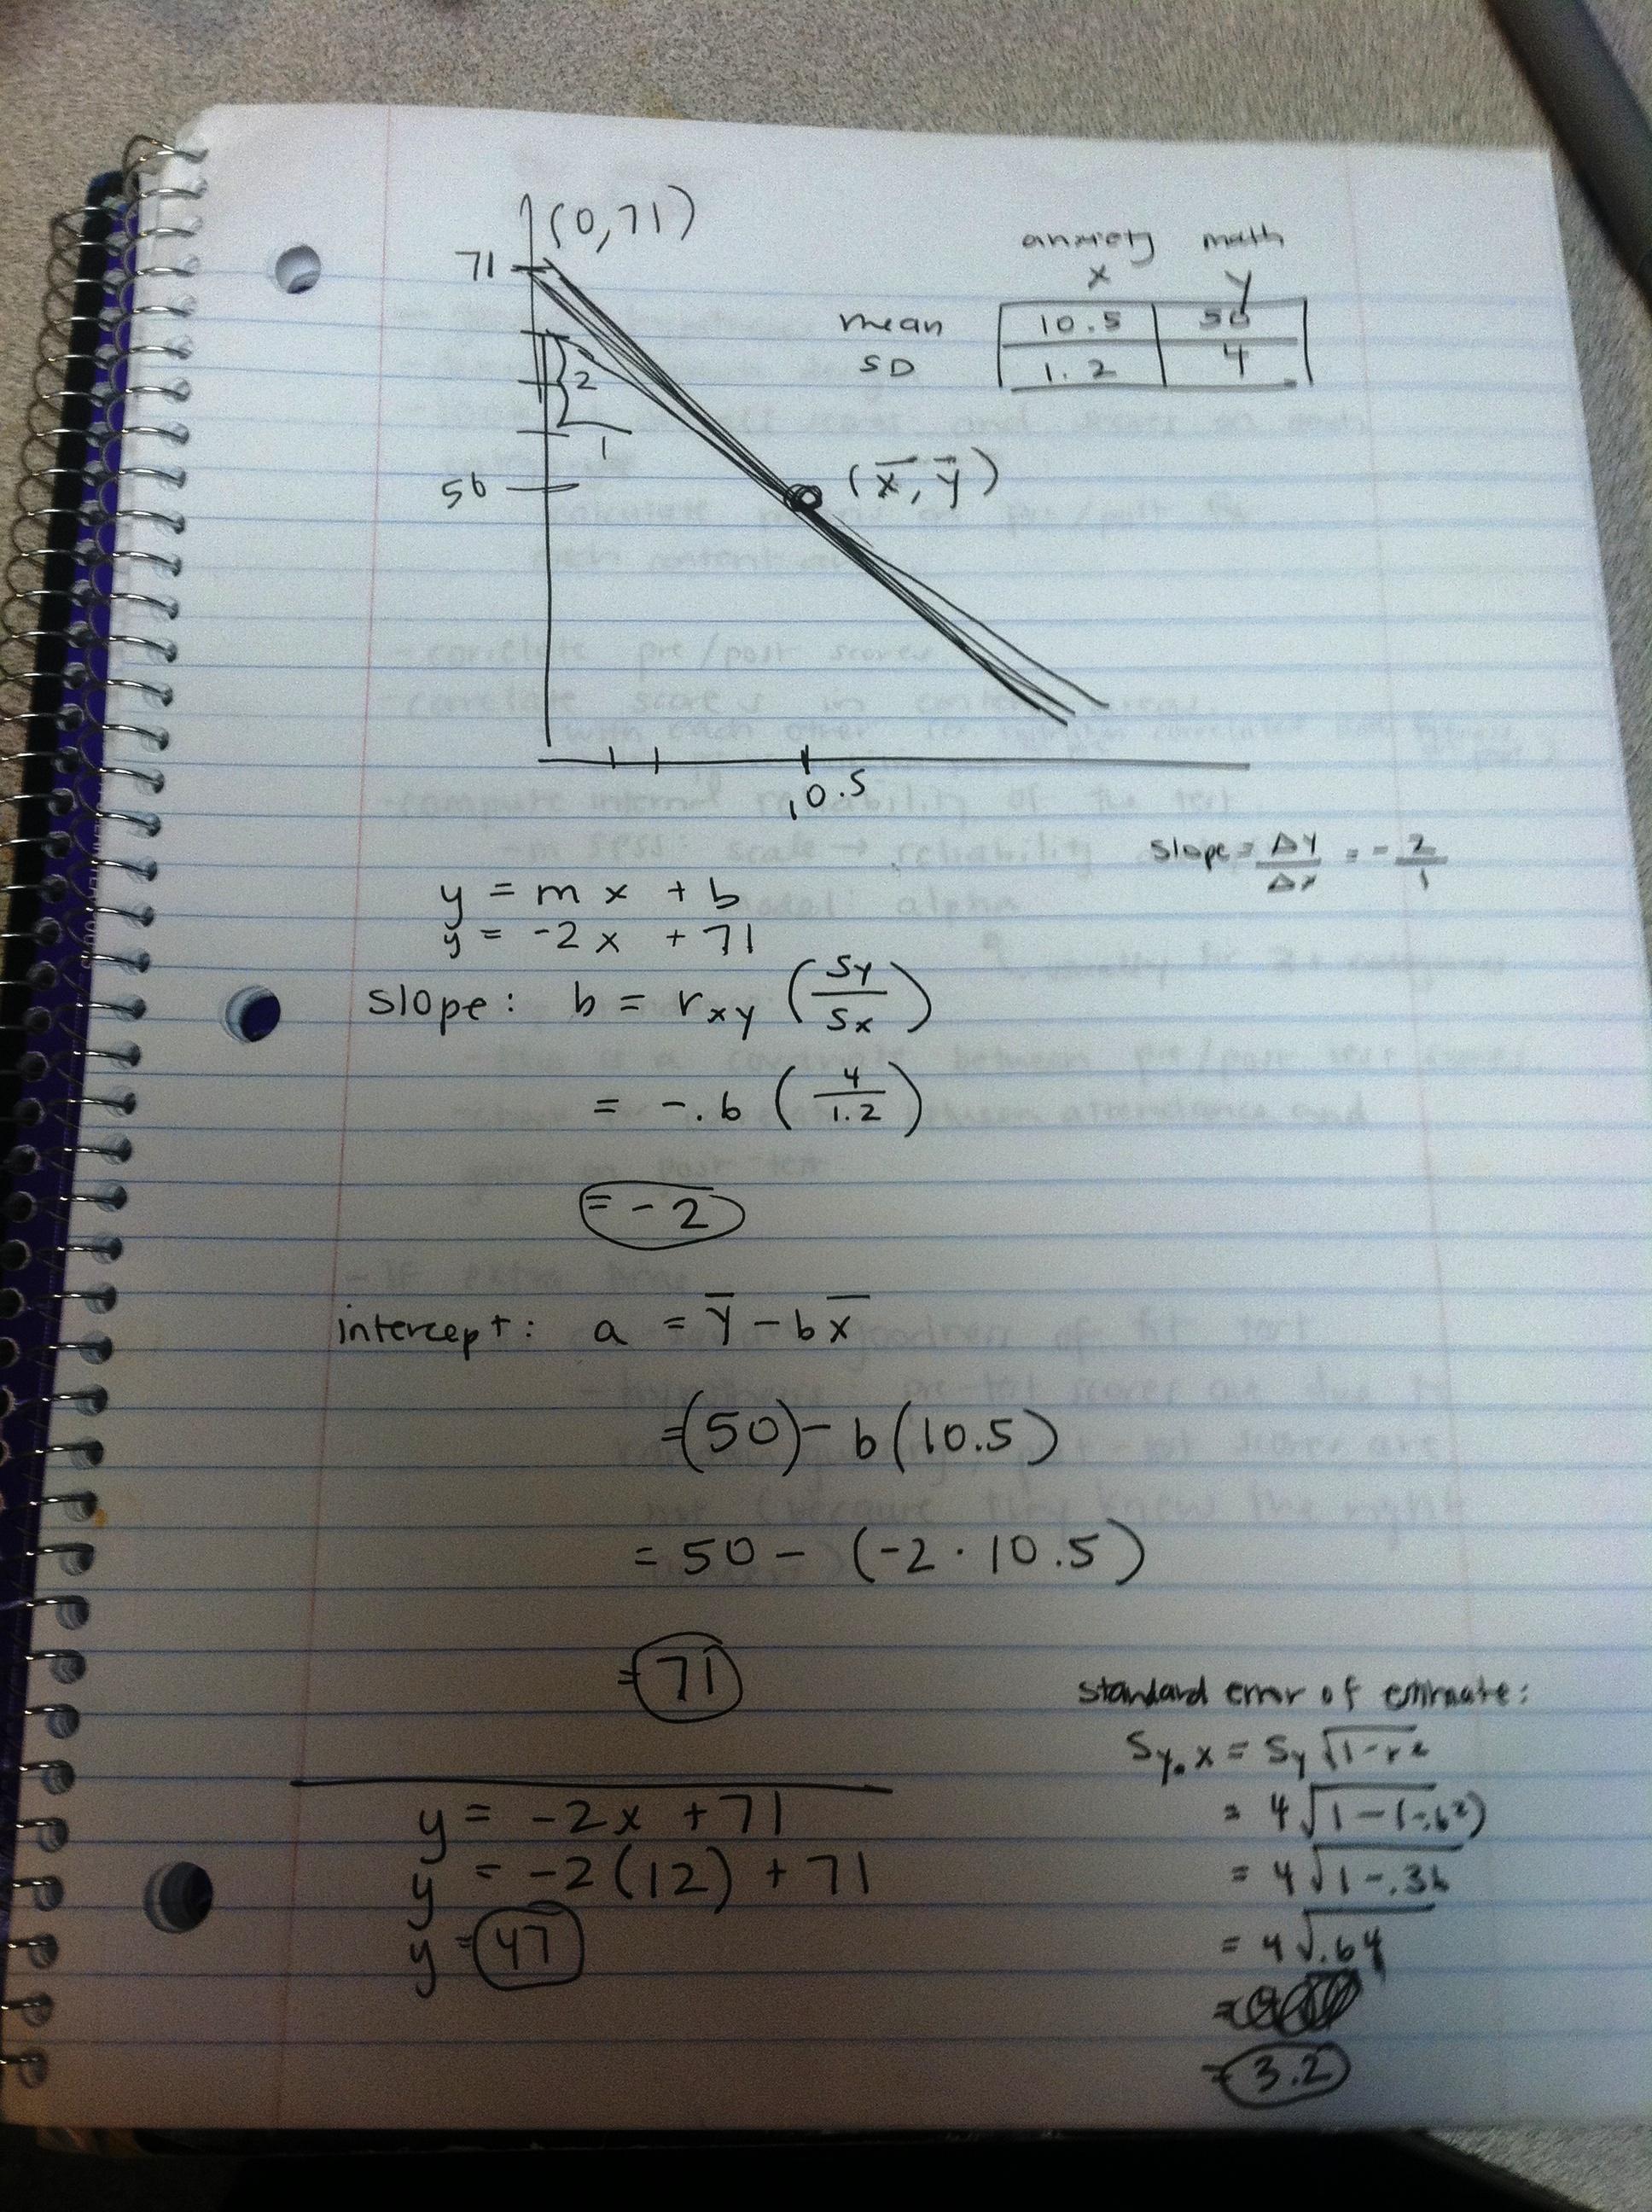 Snapshot of a notebook with an algebra math problem.